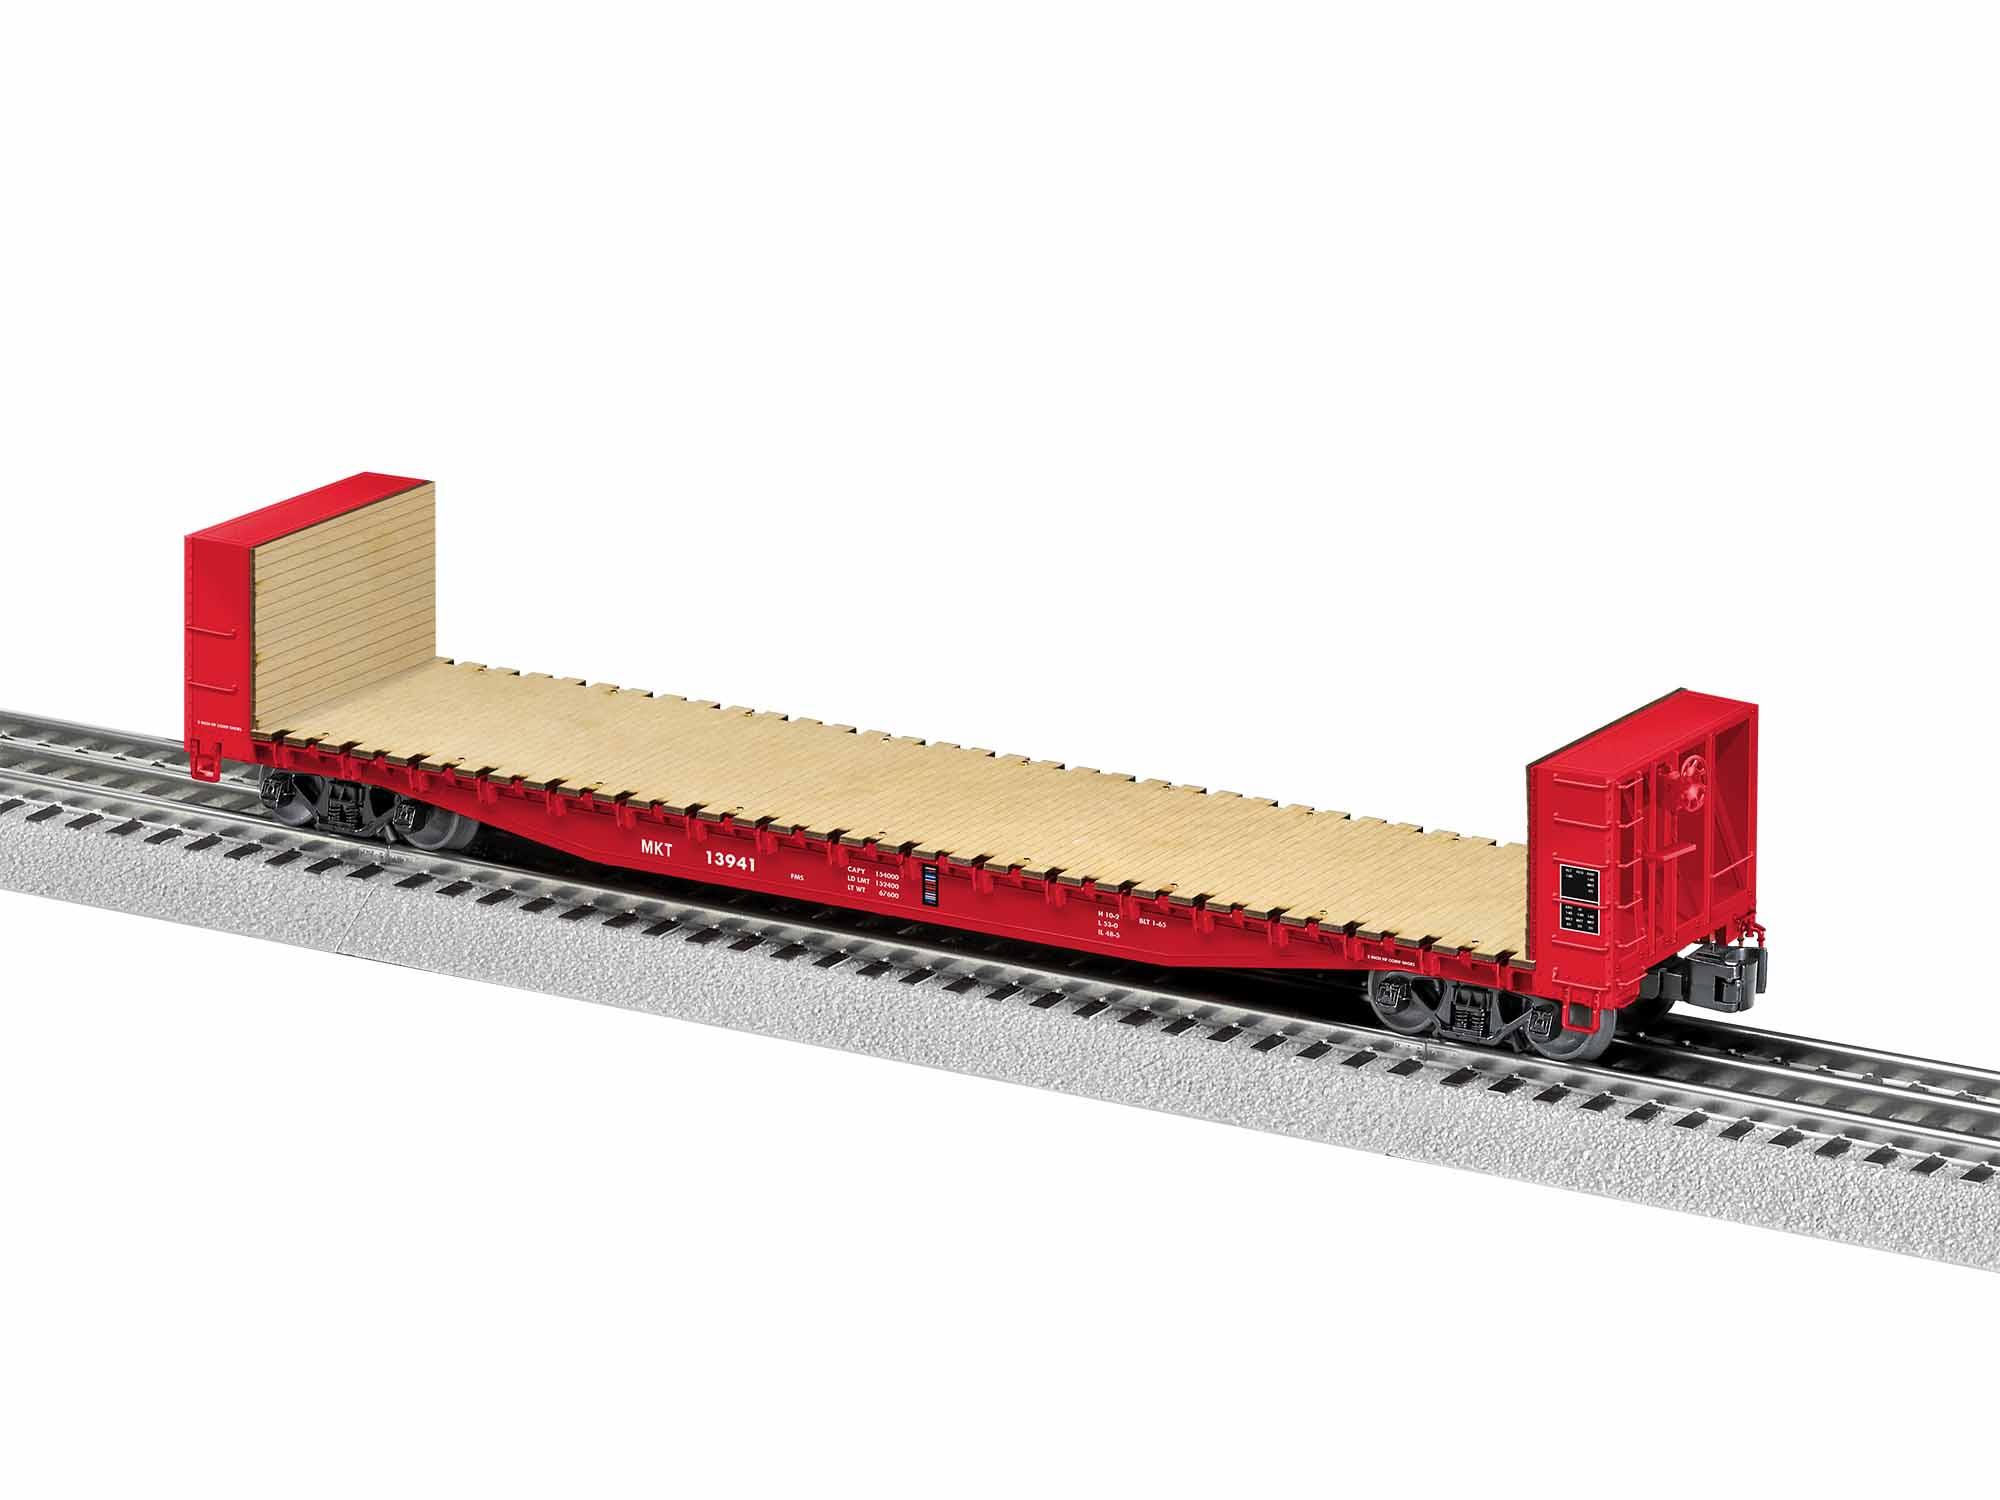 LNL1926412 Lionel O 50' Bulkhead Flatcar, MKT #13941